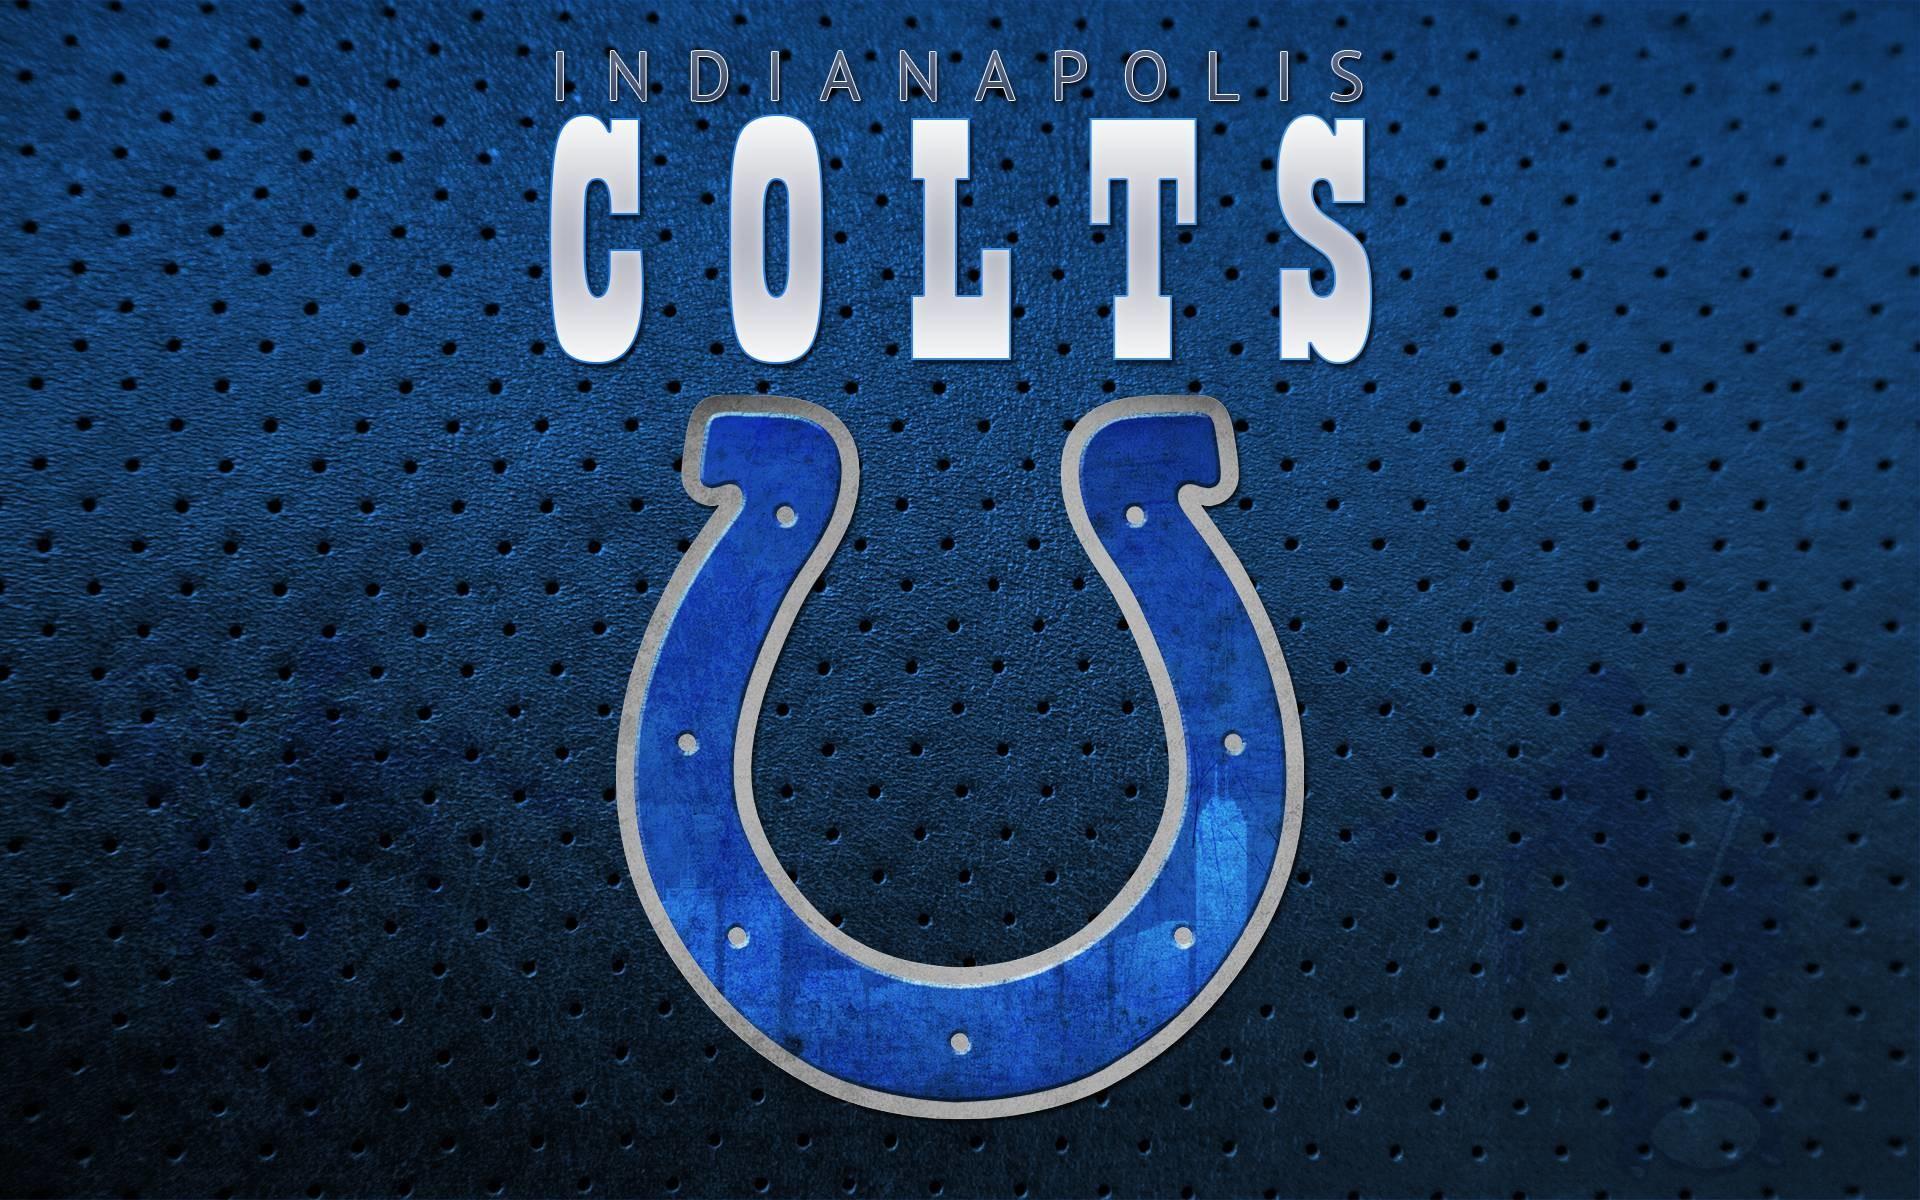 1920x1200 Indianapolis Colts Logo Wallpaper NFL Sport 74320 High